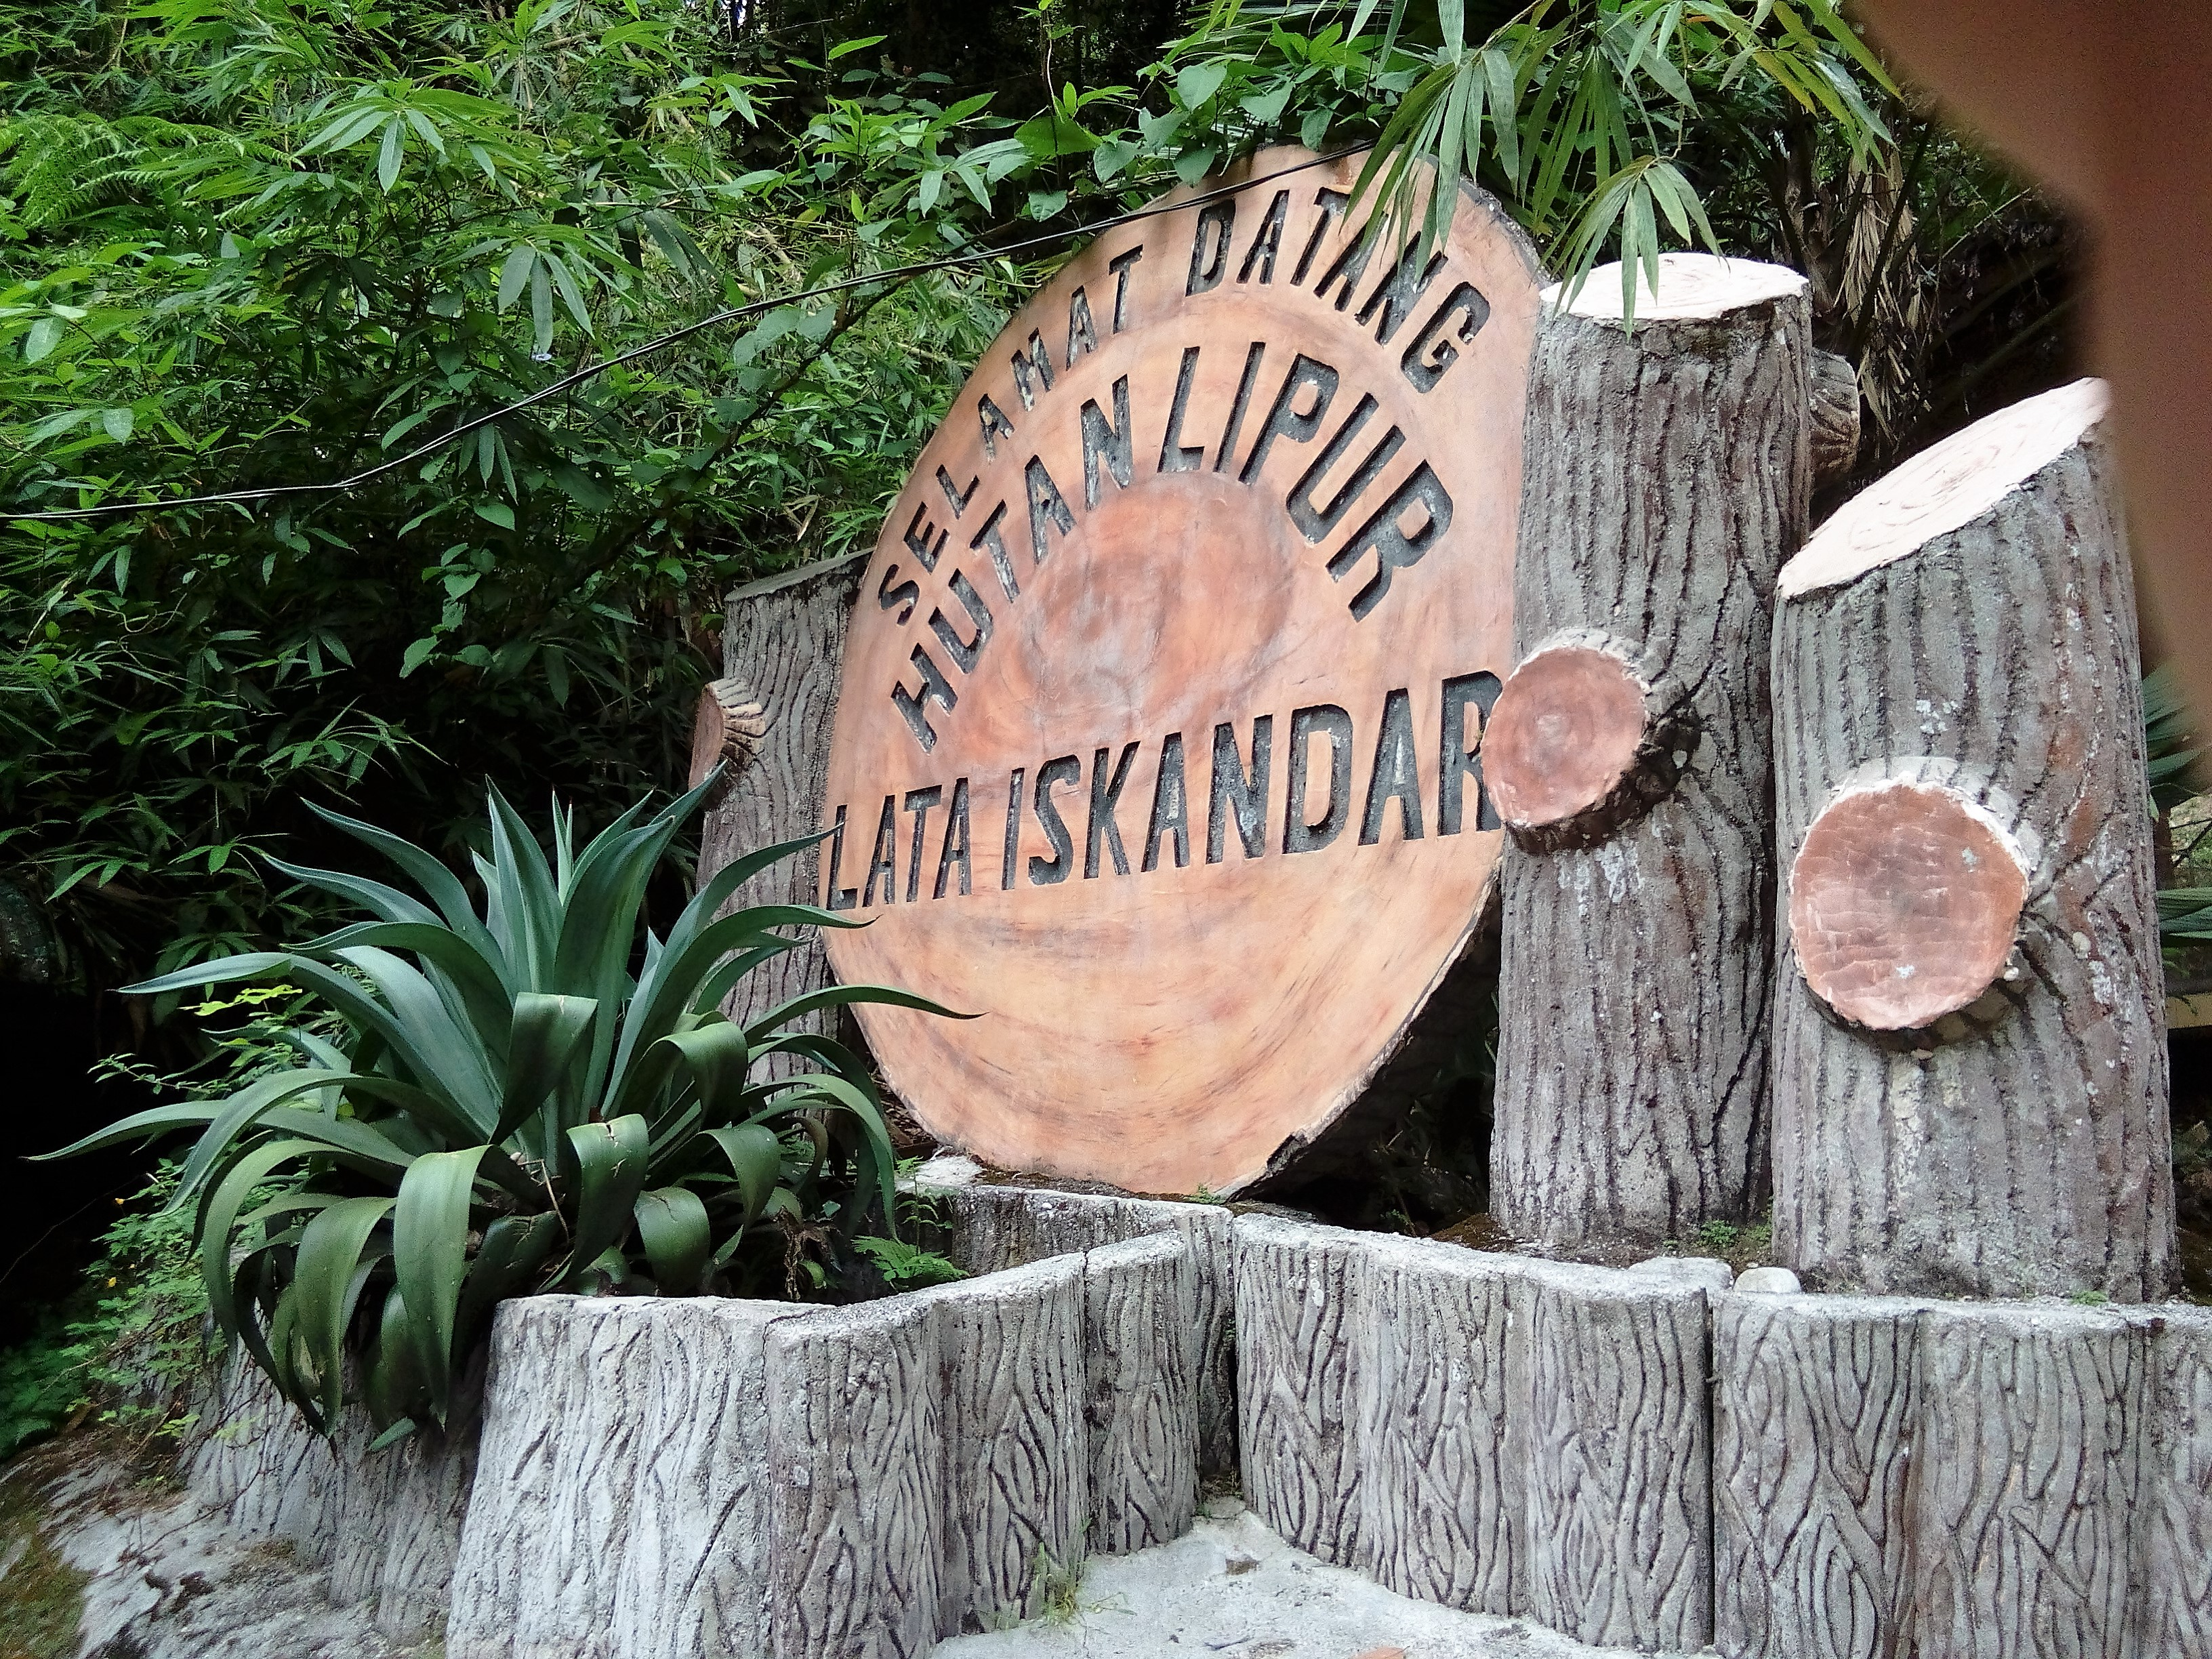 Welcome to Lata Iskandar